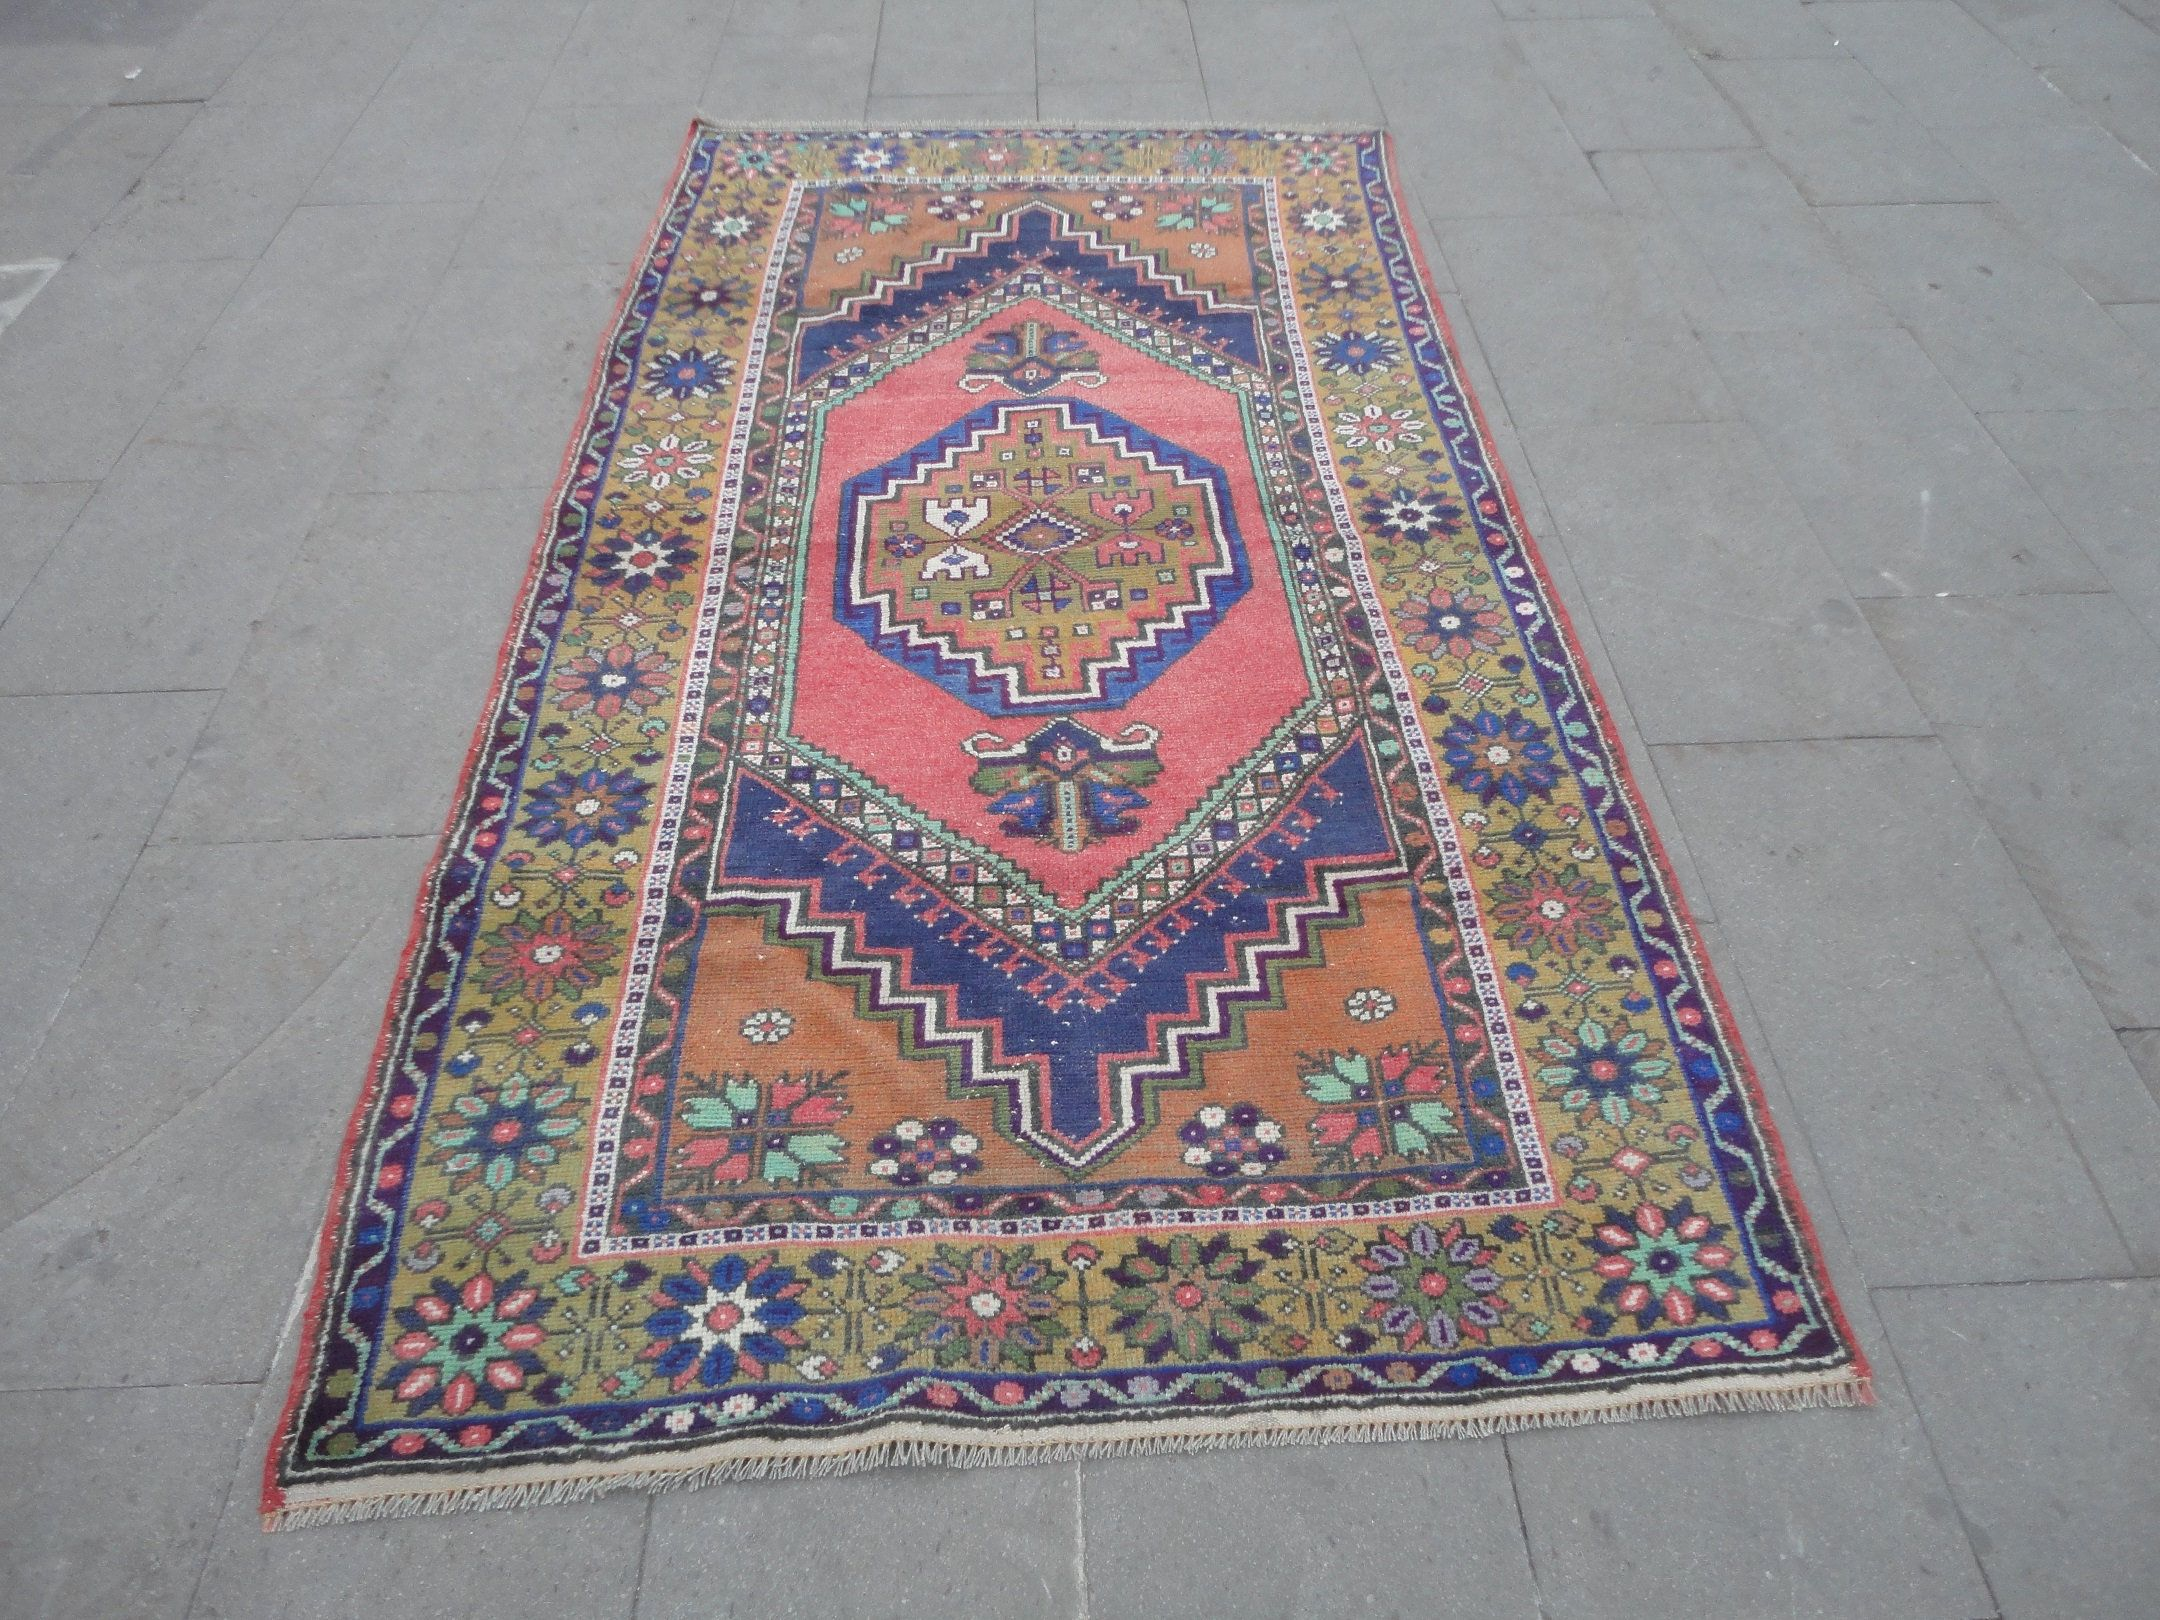 "Dining Room Rug,Vintage Turkish Low Pile Carpet,Bedroom Rug 7′ 4"" x 3′ 9"" FT,Wool Area Boho Rug,Hand Knotted Vibrant Office Rug Carpet HER"